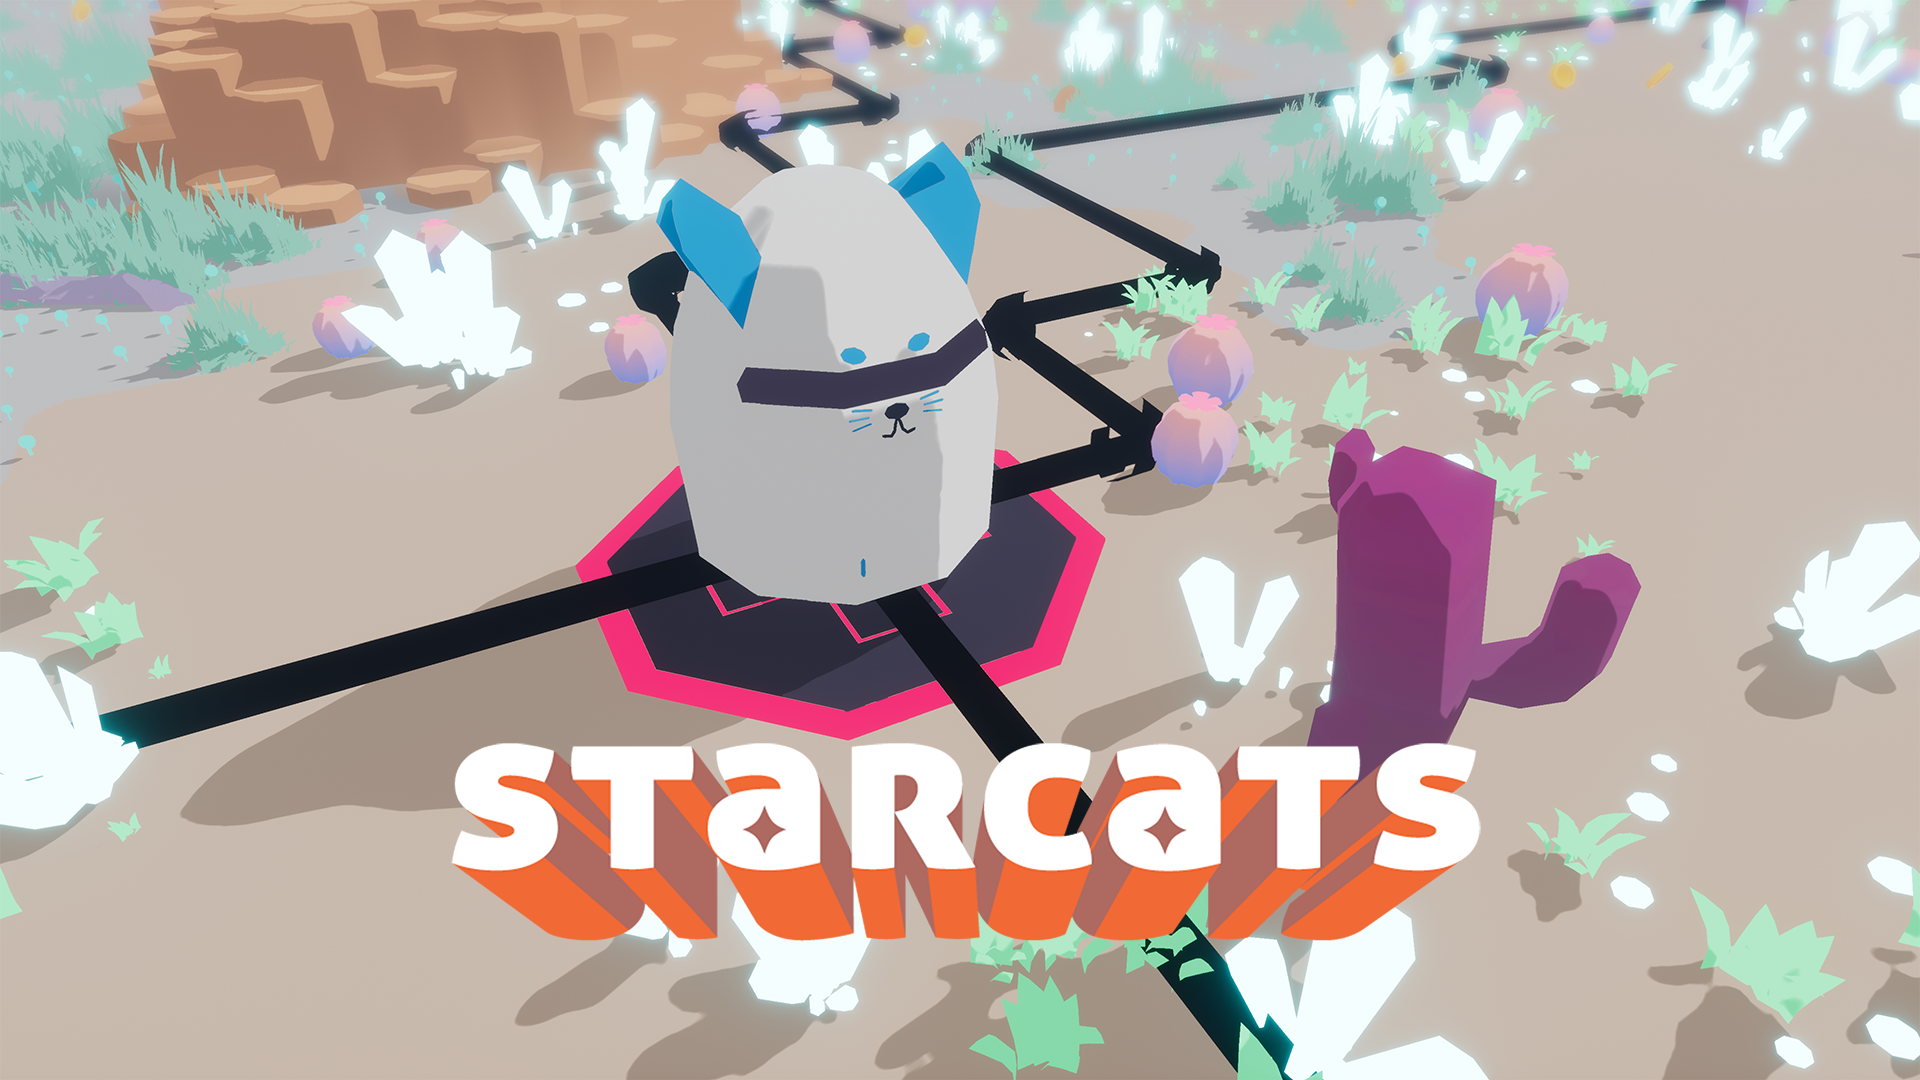 Starcats